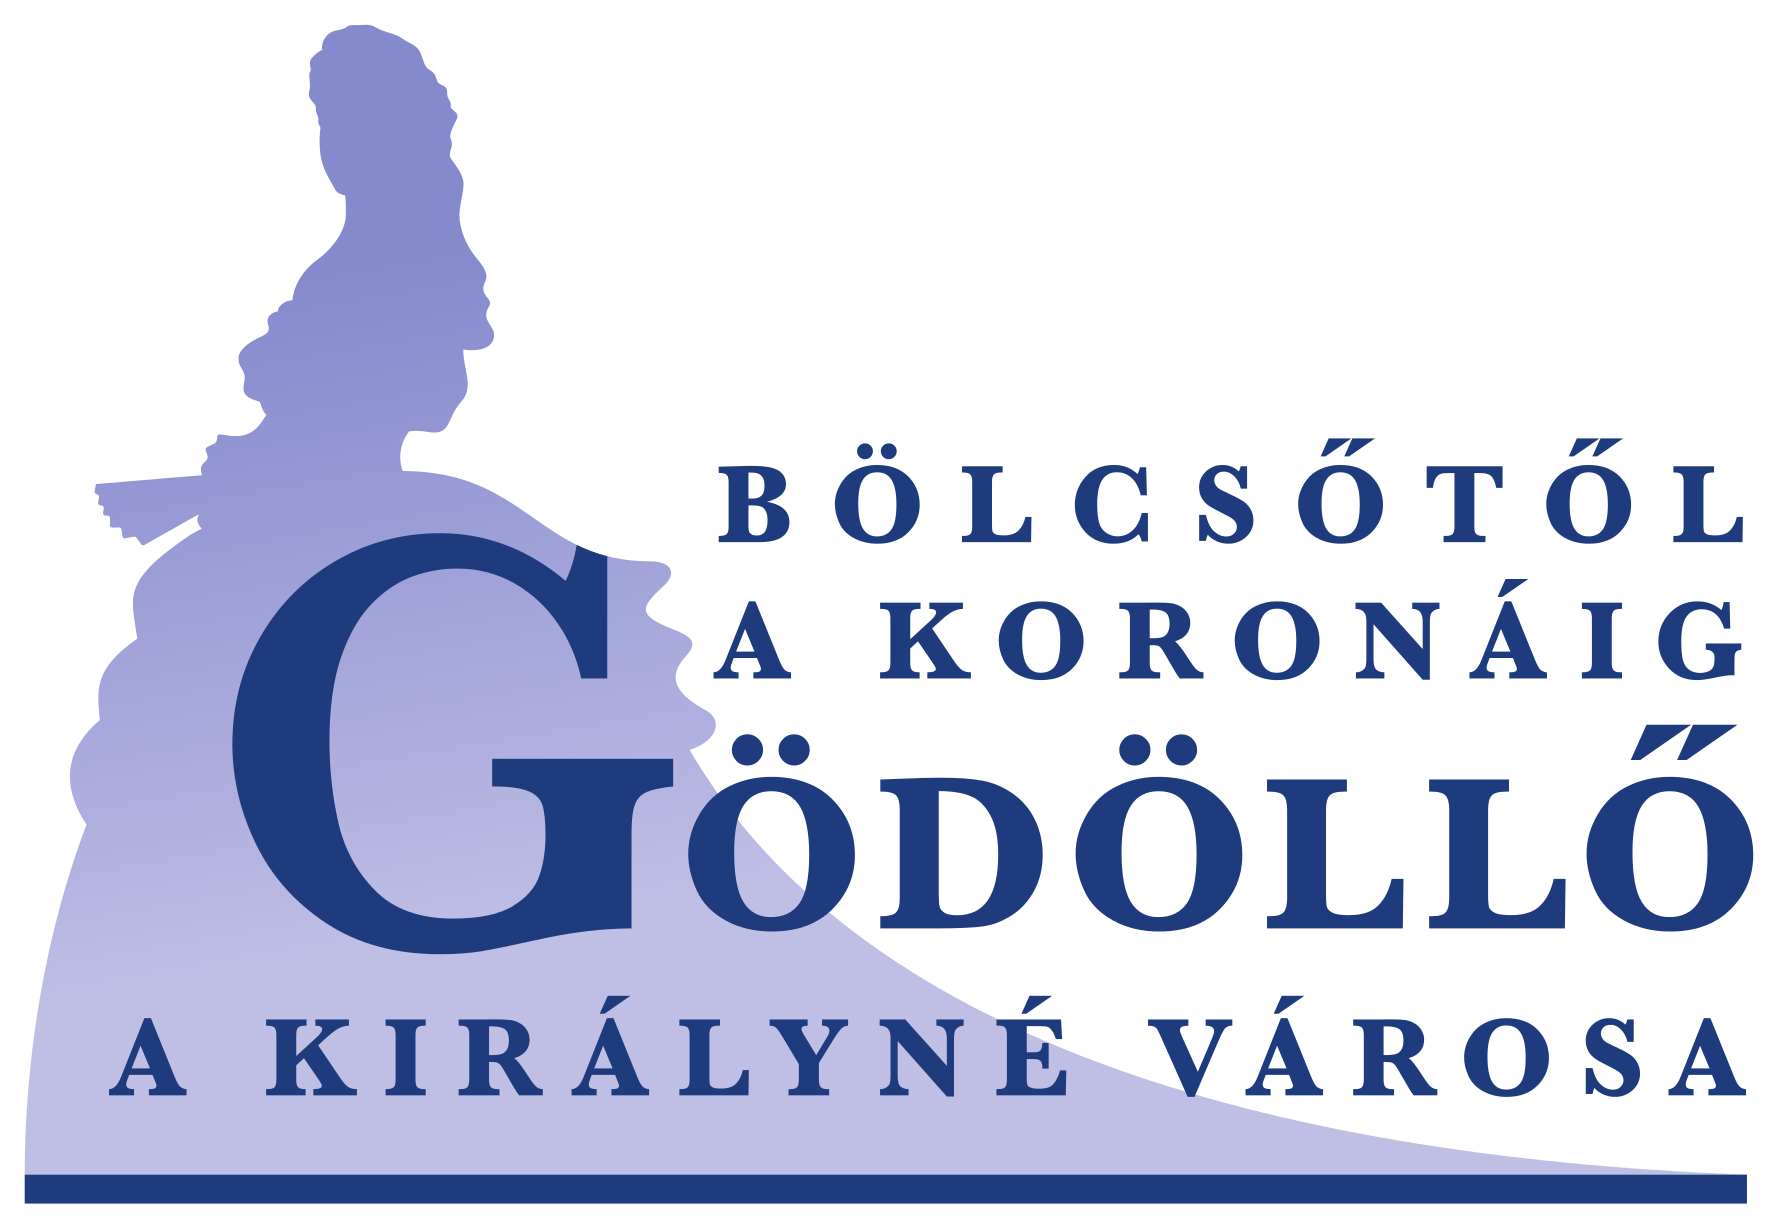 Godollo-2017_LOGO_vektoros-nyomdai